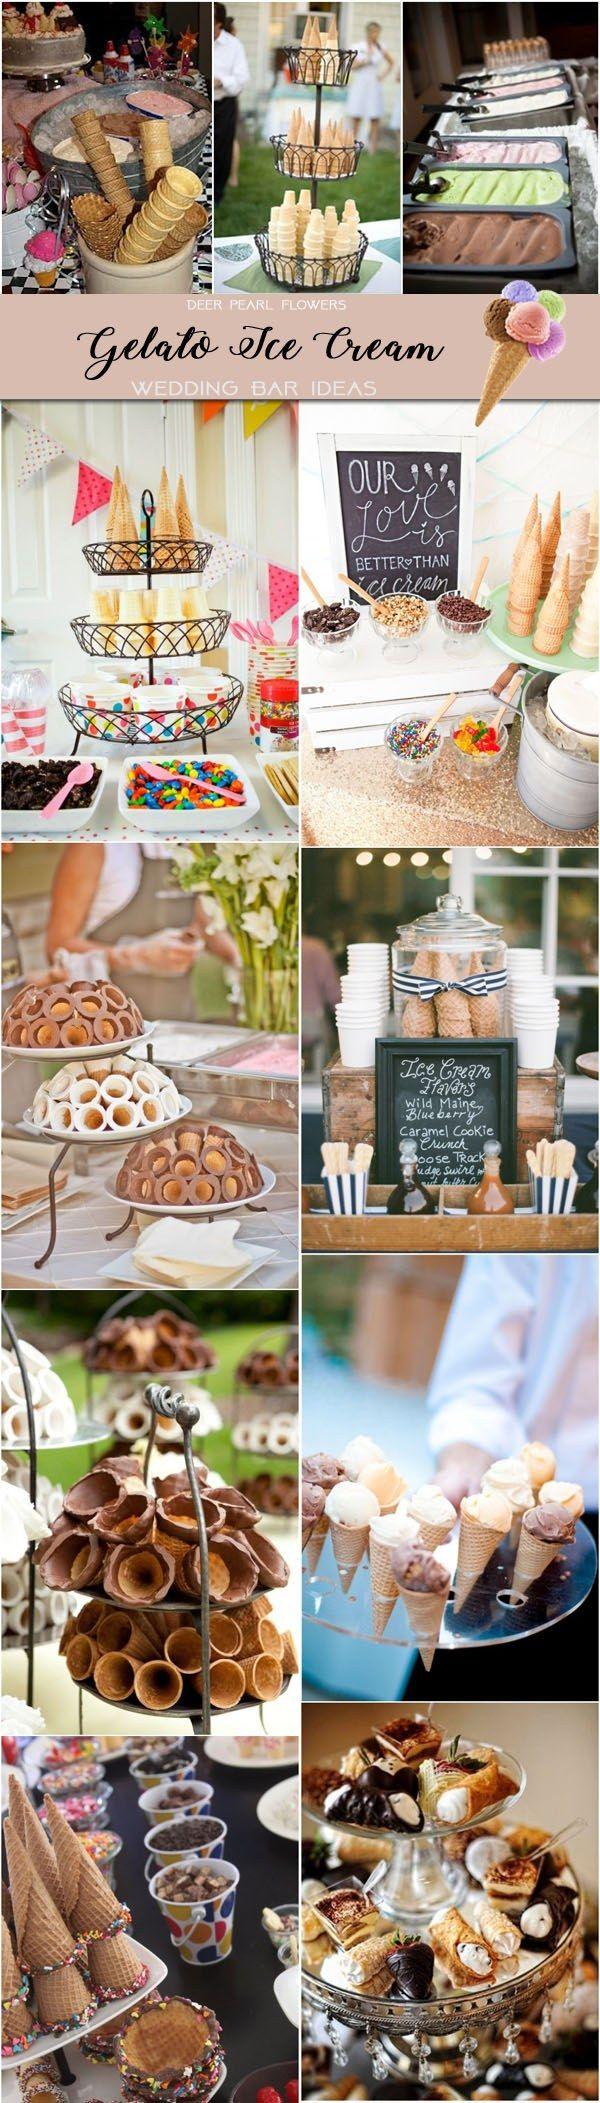 gelato ice cream wedding dessert food bar ideas / http://www.deerpearlflowers.com/wedding-catering-trends-dessert-bar-ideas/